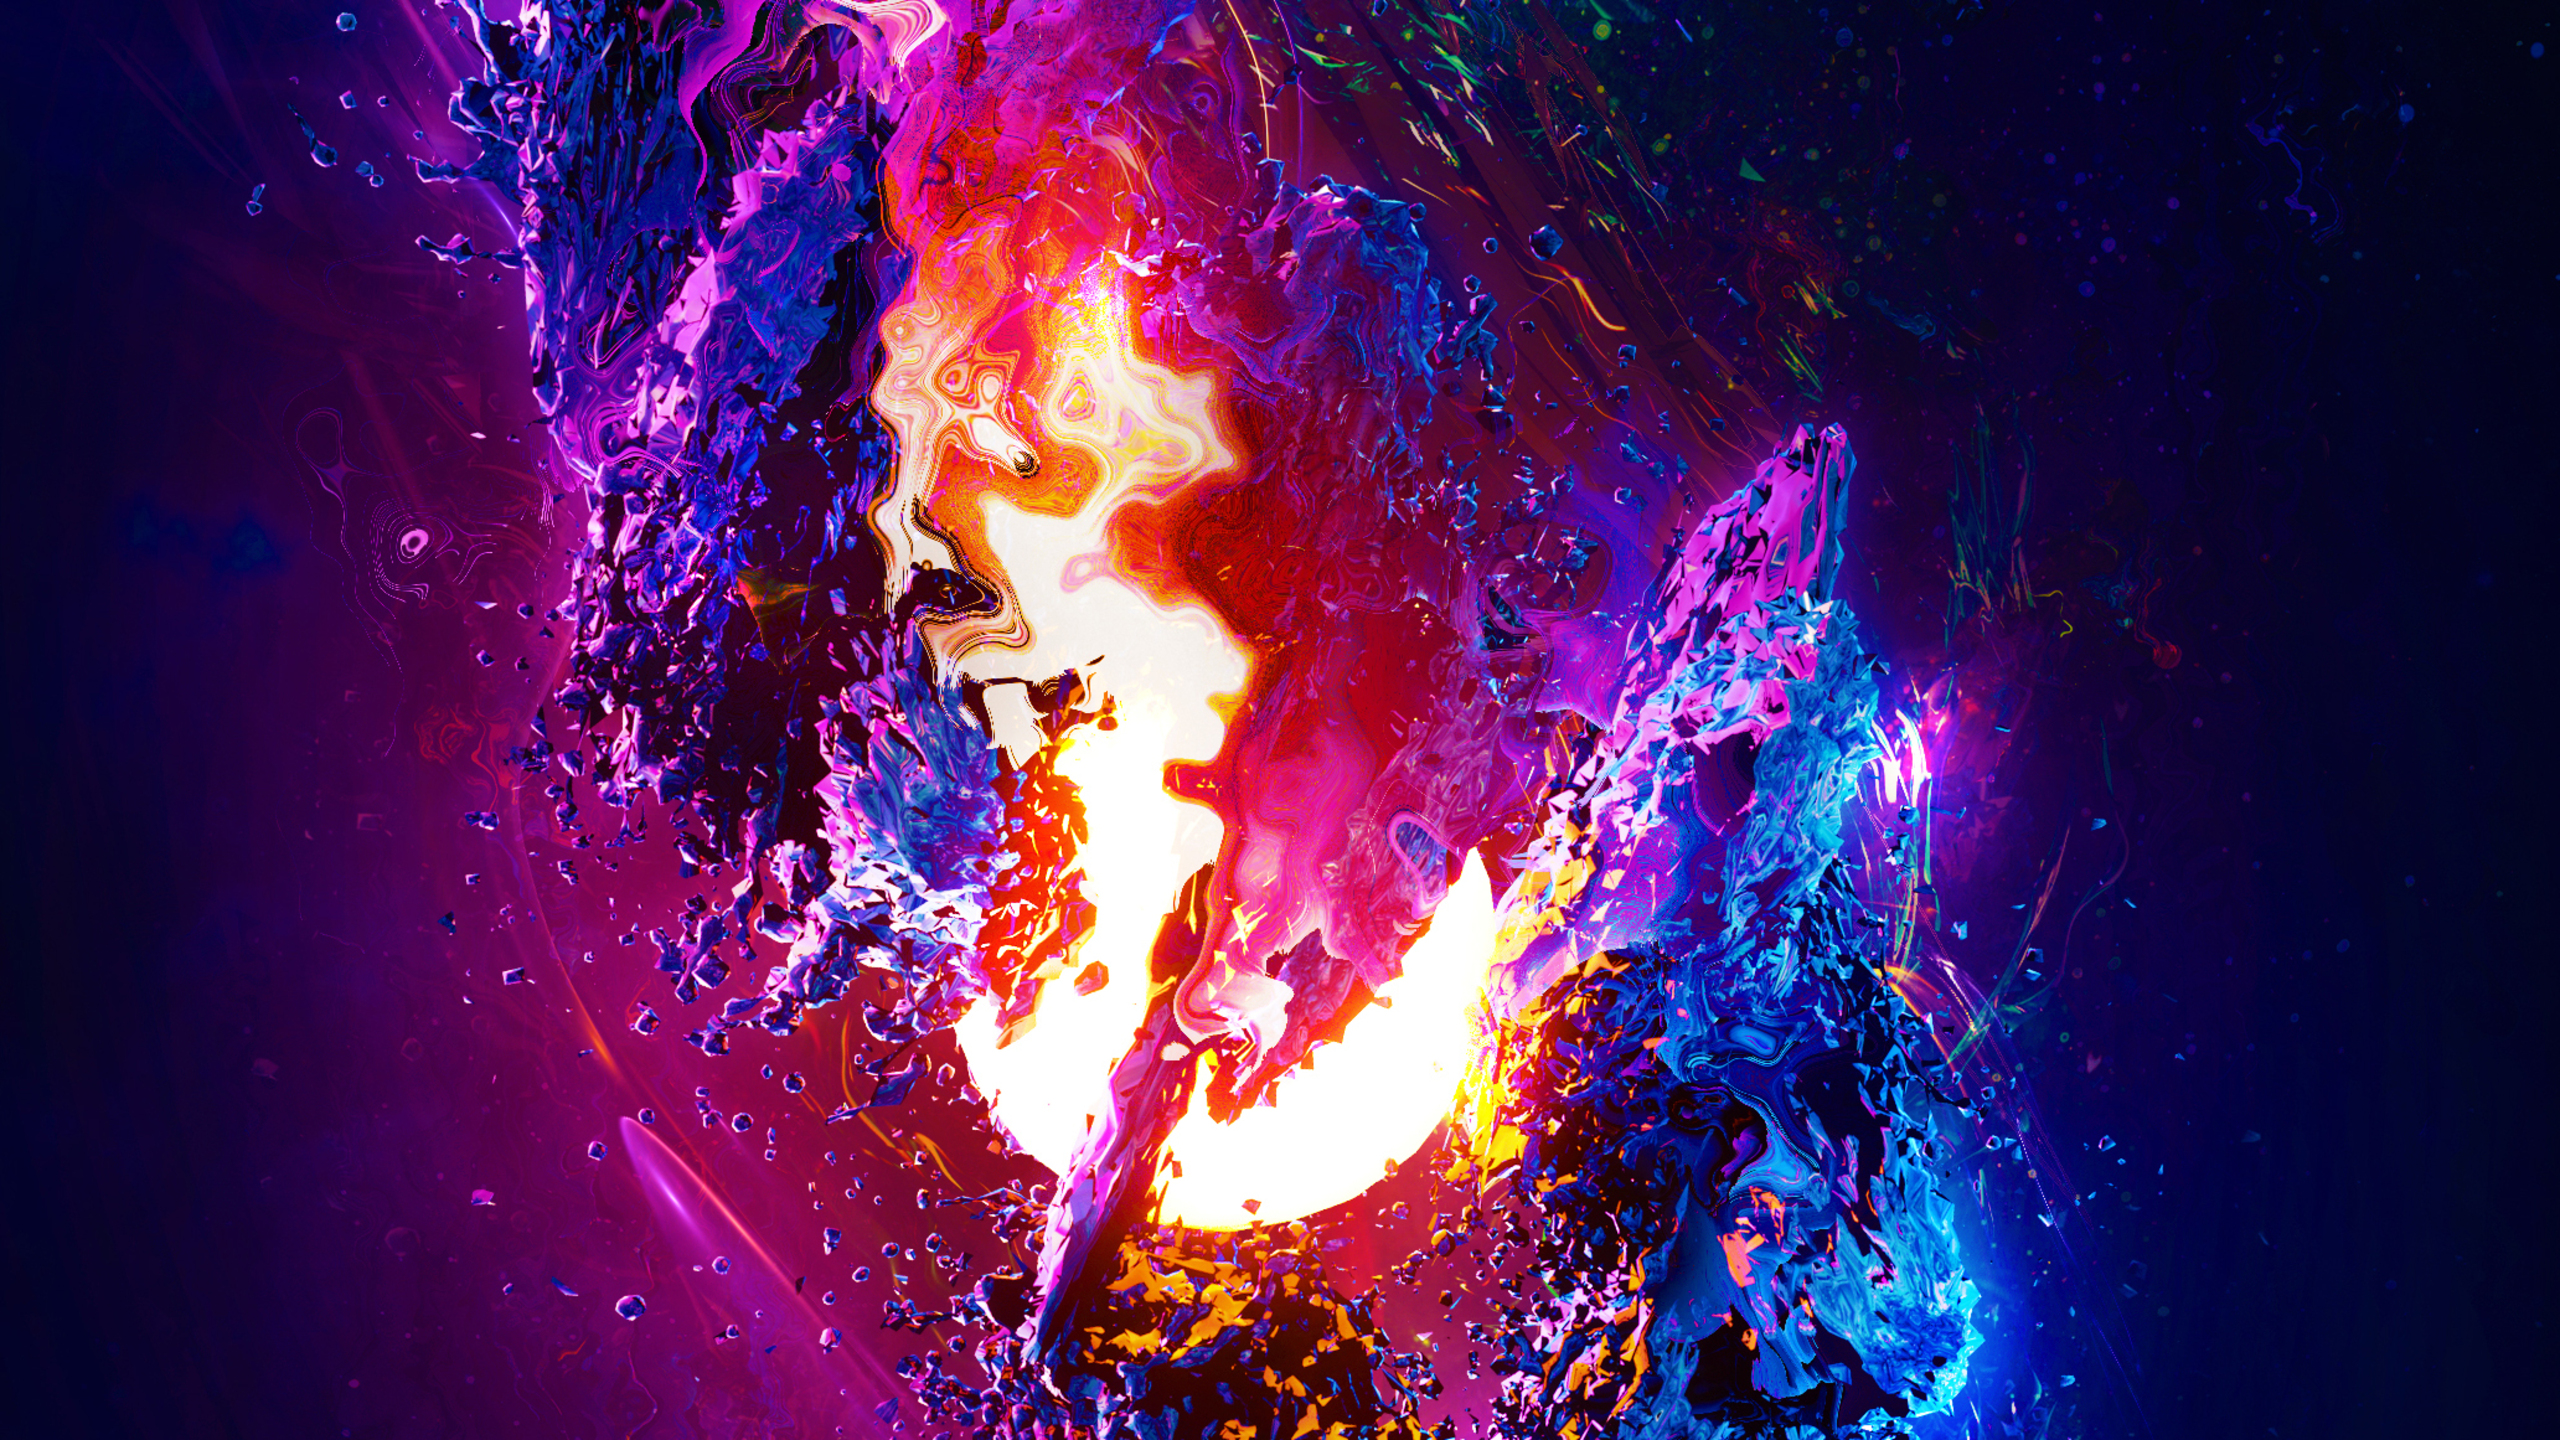 digital-art-4d-rz.jpg